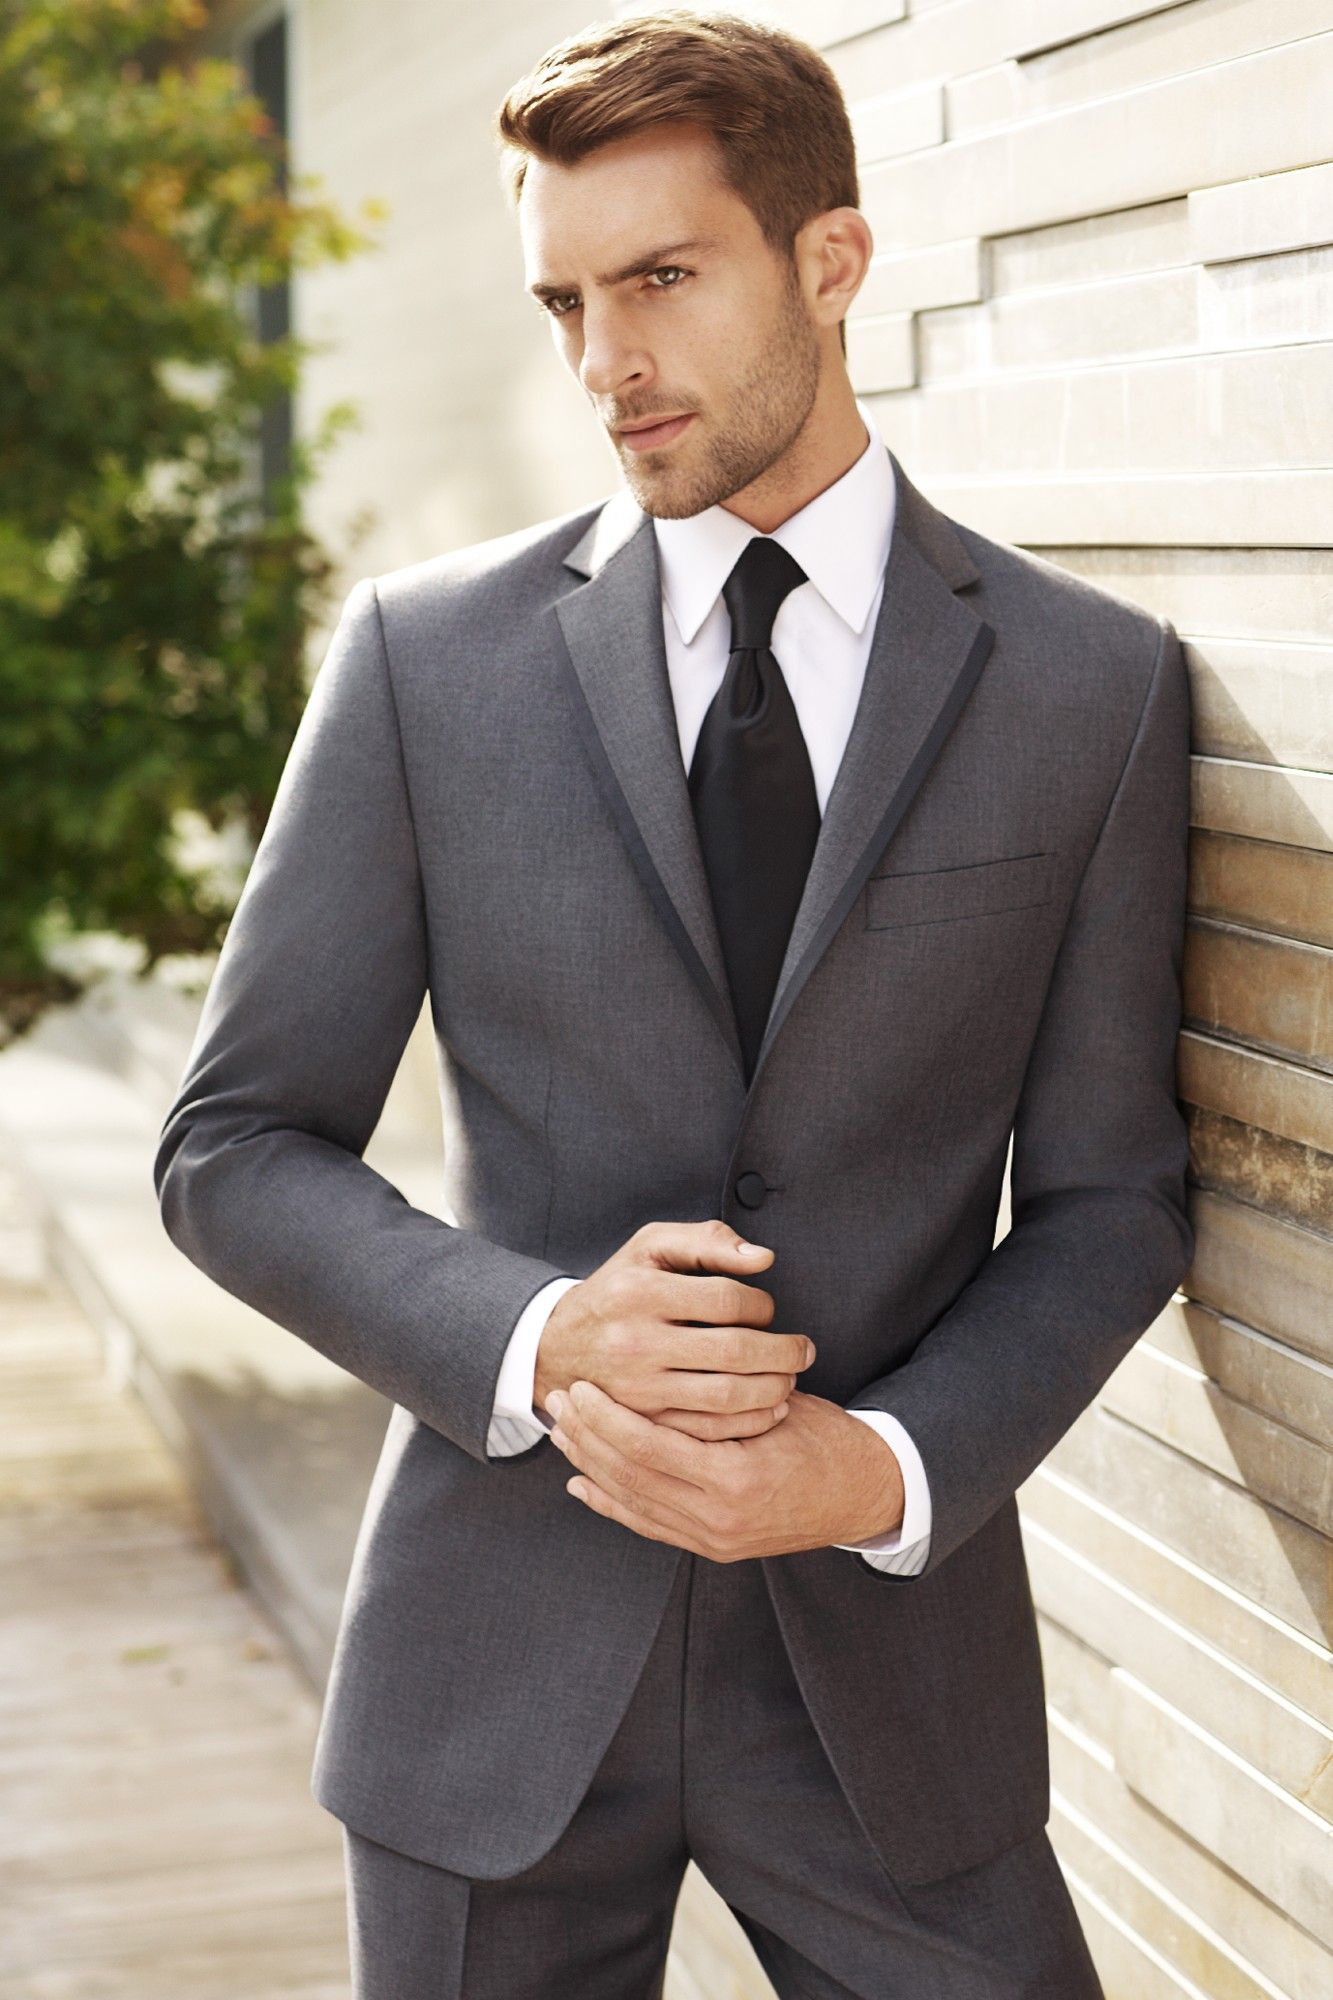 groomsmen medium grey suit, blue tie (NEED TO MATCH